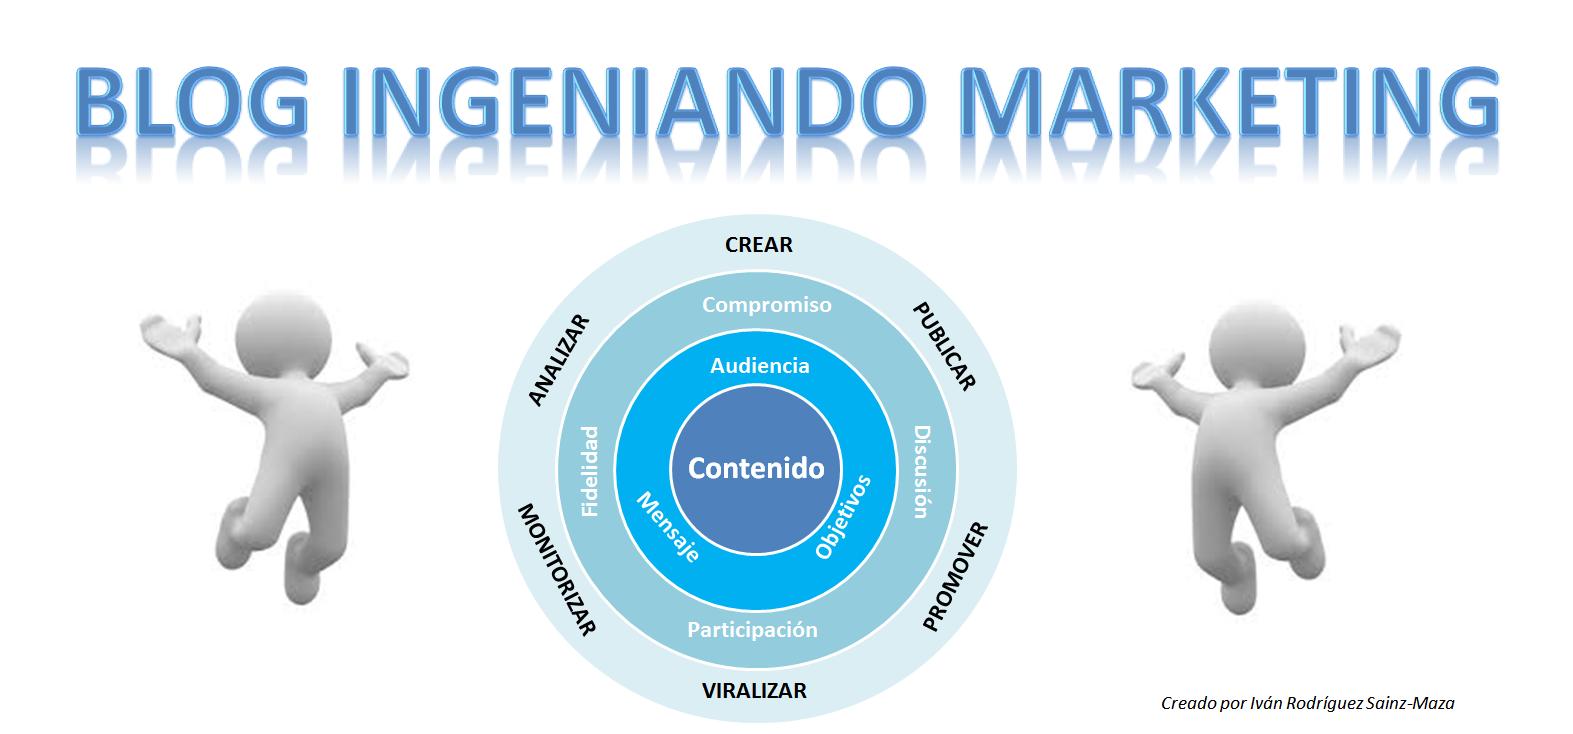 Blog Ingeniando Marketing